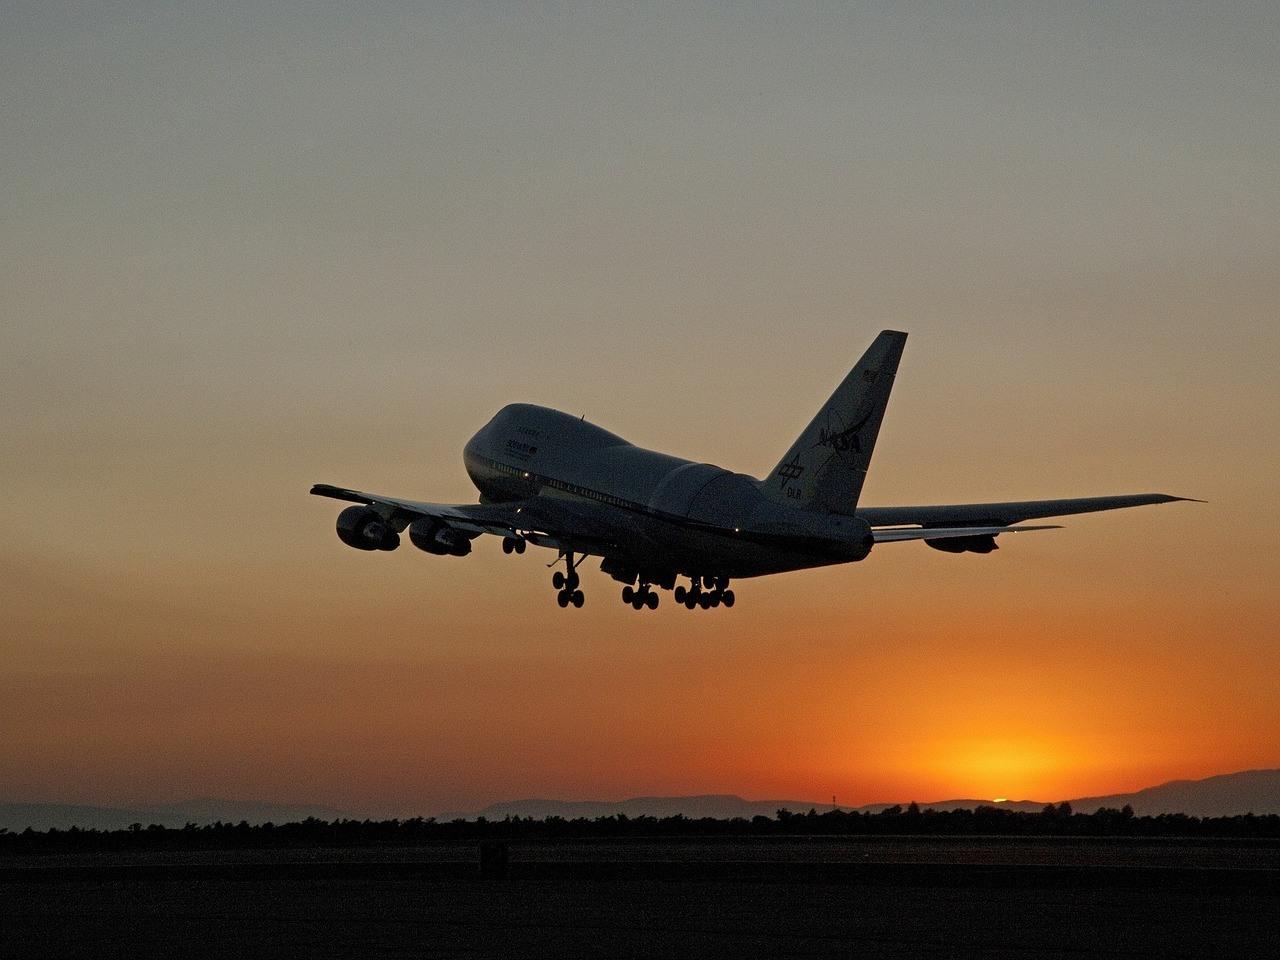 jetliner-1767857_1280